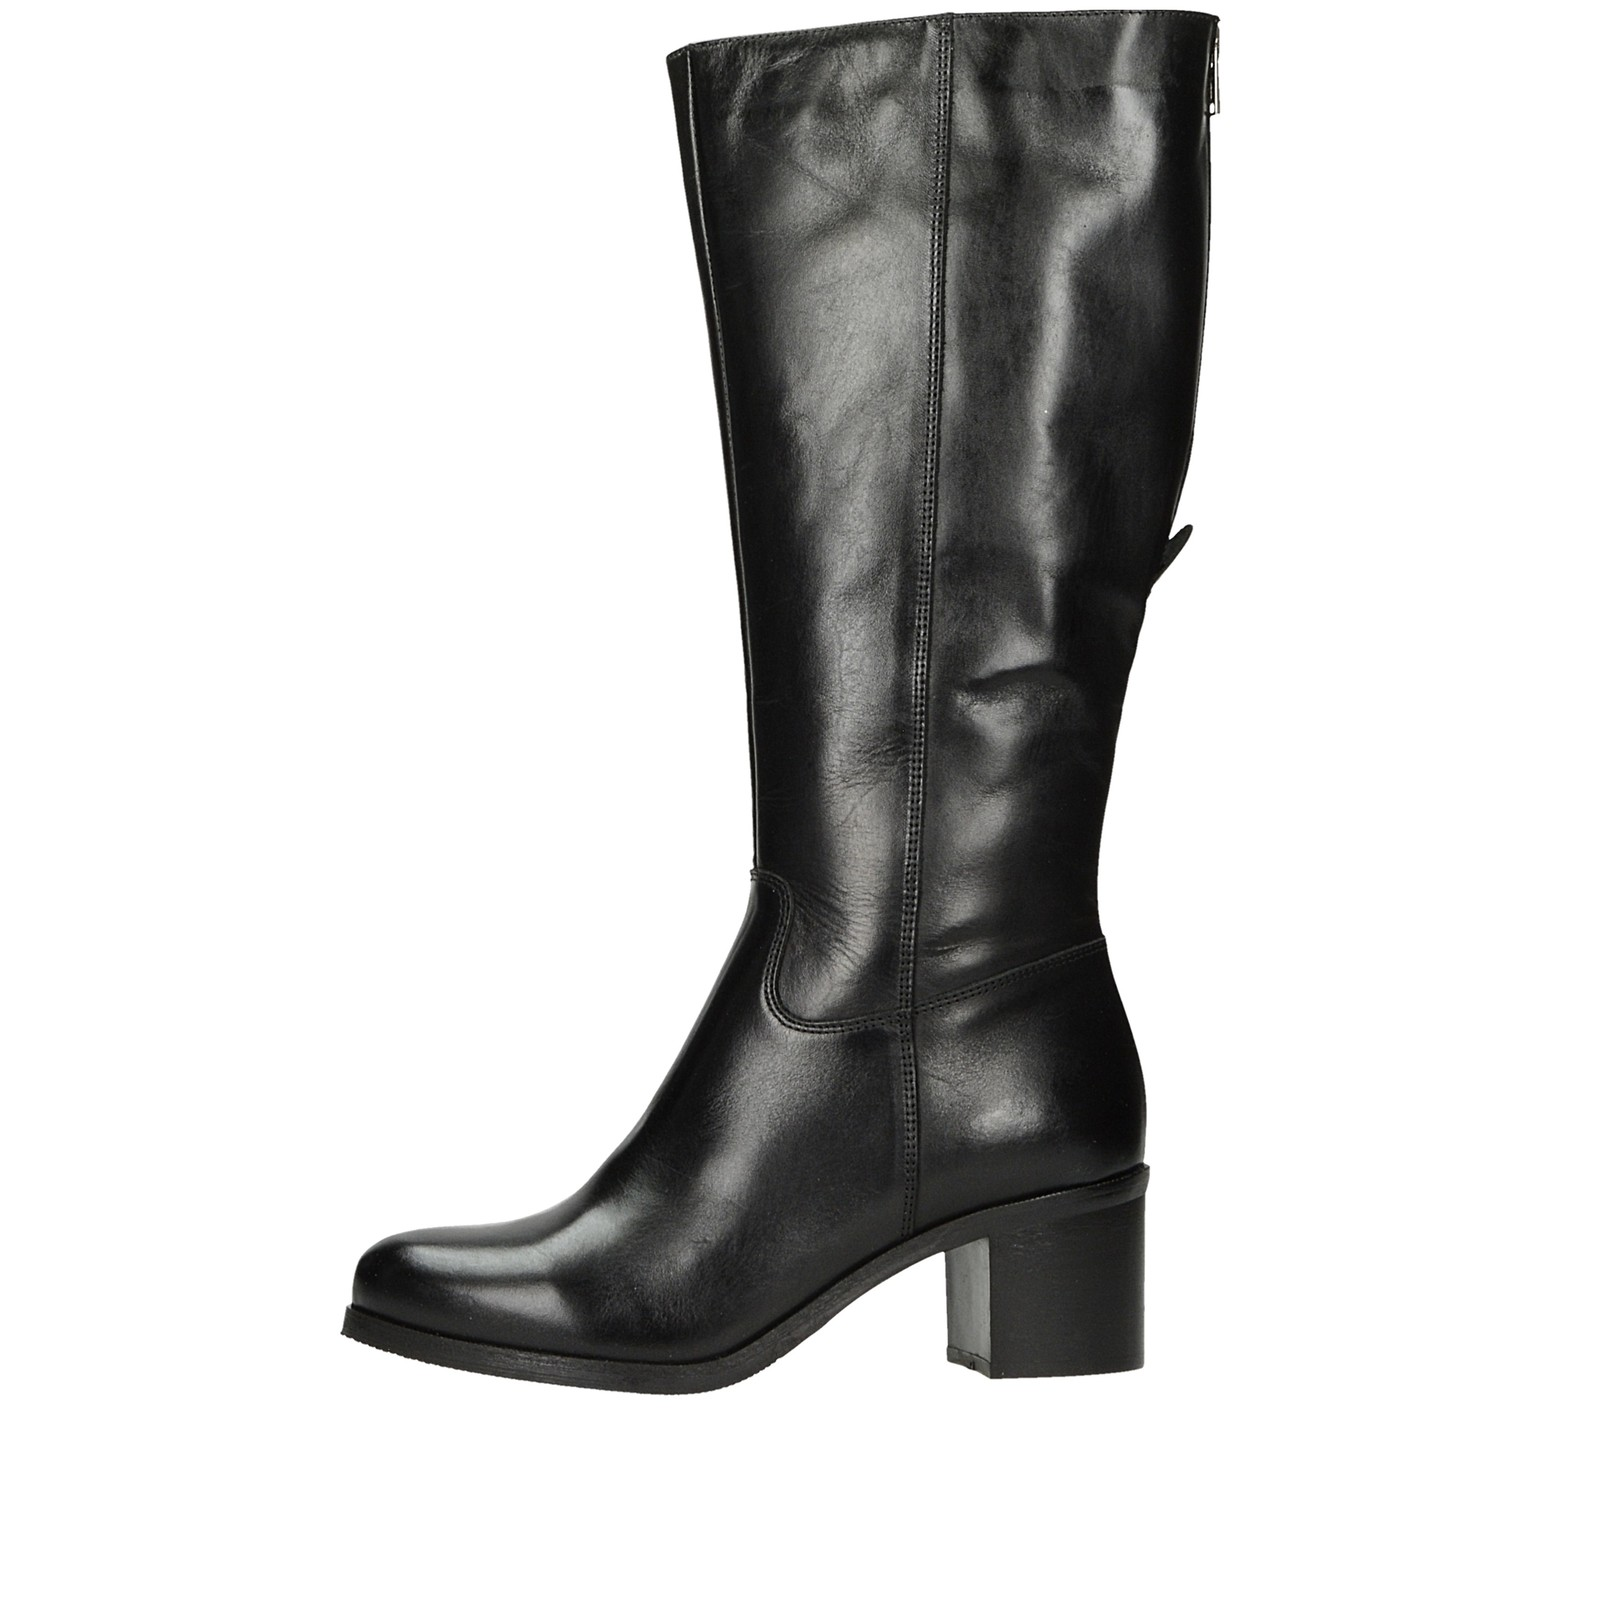 5530d2ba11e50 Acord dámske kožené vysoké čižmy - čierne | 1592-BLK www.robel.sk